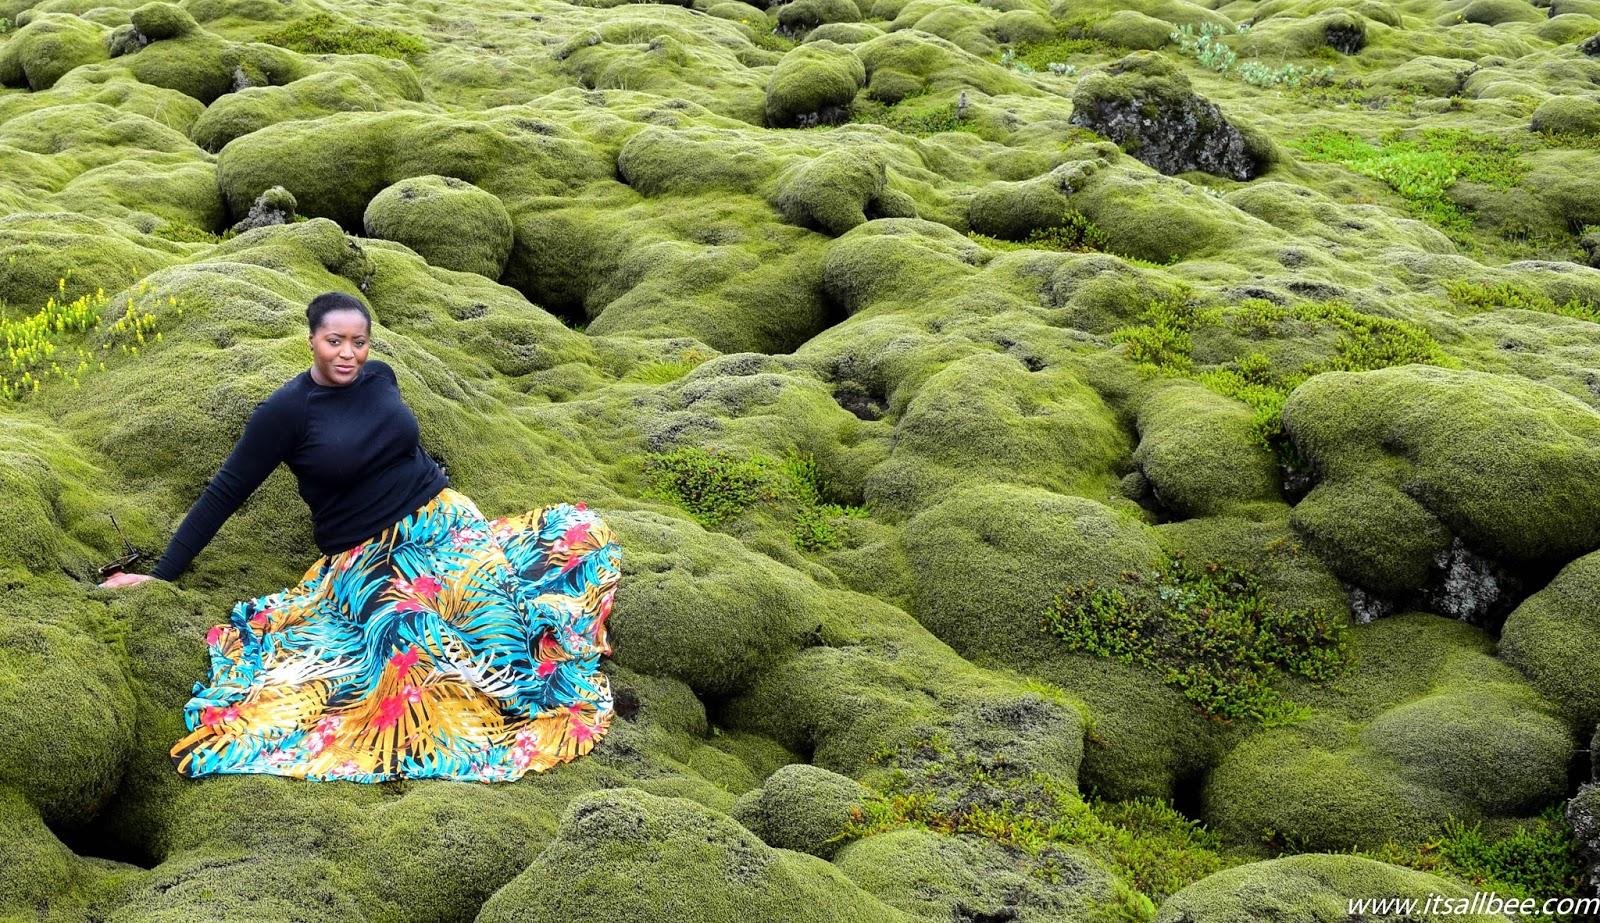 Eldhraun Lava Field Iceland | Iceland Lava Fields